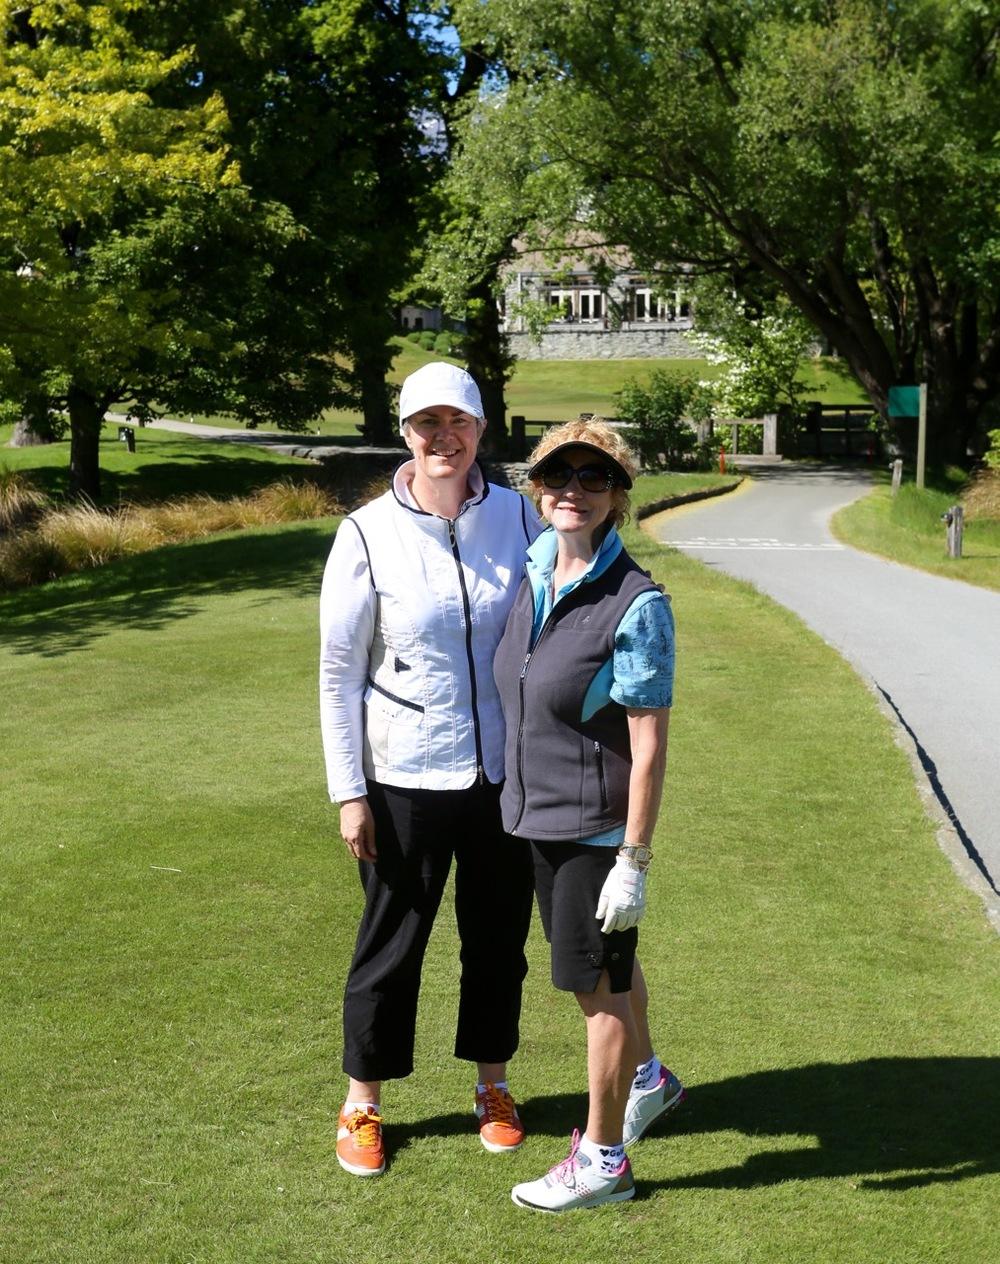 Rhonda norman (left) and PJ Hennessey at millbrook nov 2015